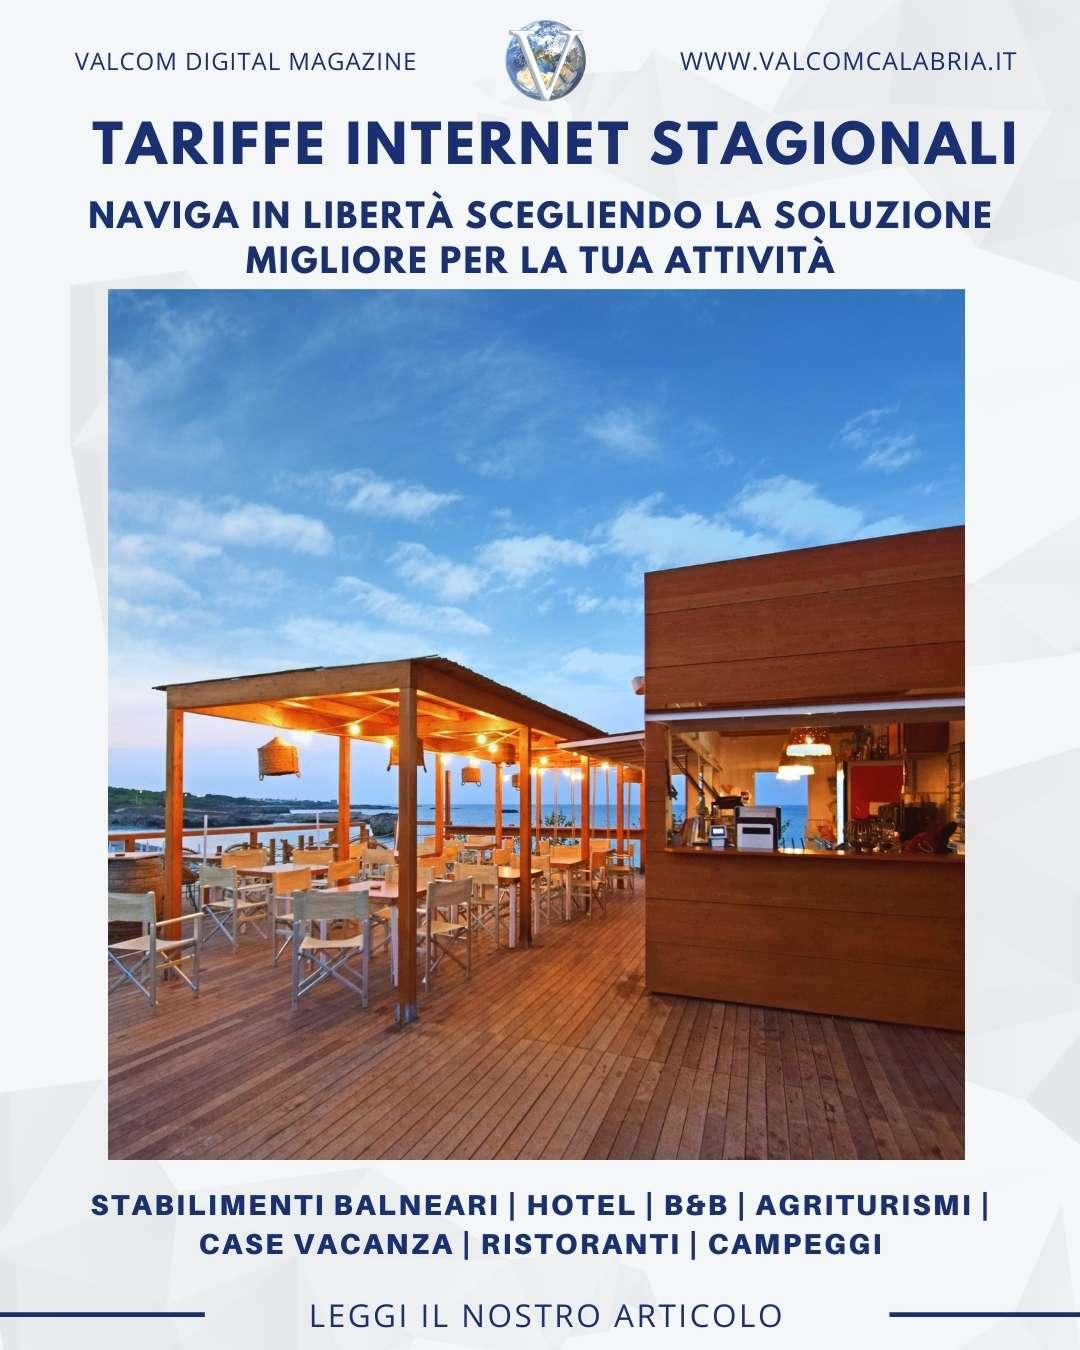 Valcom Calabria - Tariffe Internet Stagionali